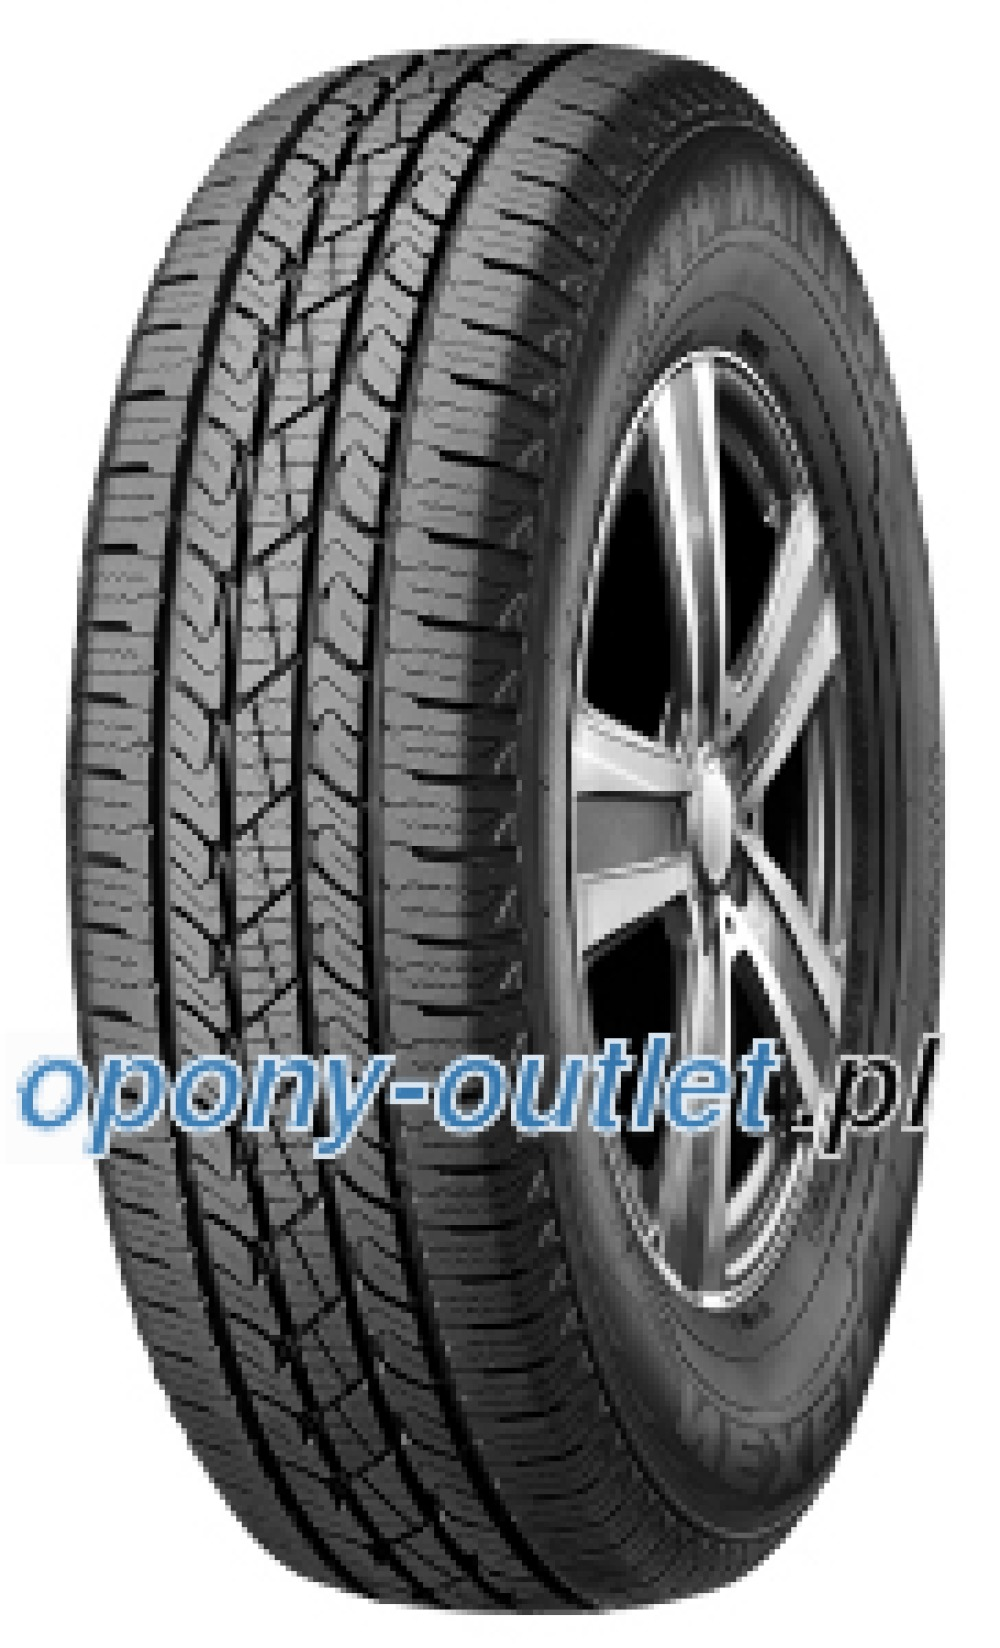 Nexen Roadian HTX RH5 ( LT225/75 R16 115/112Q 10PR )